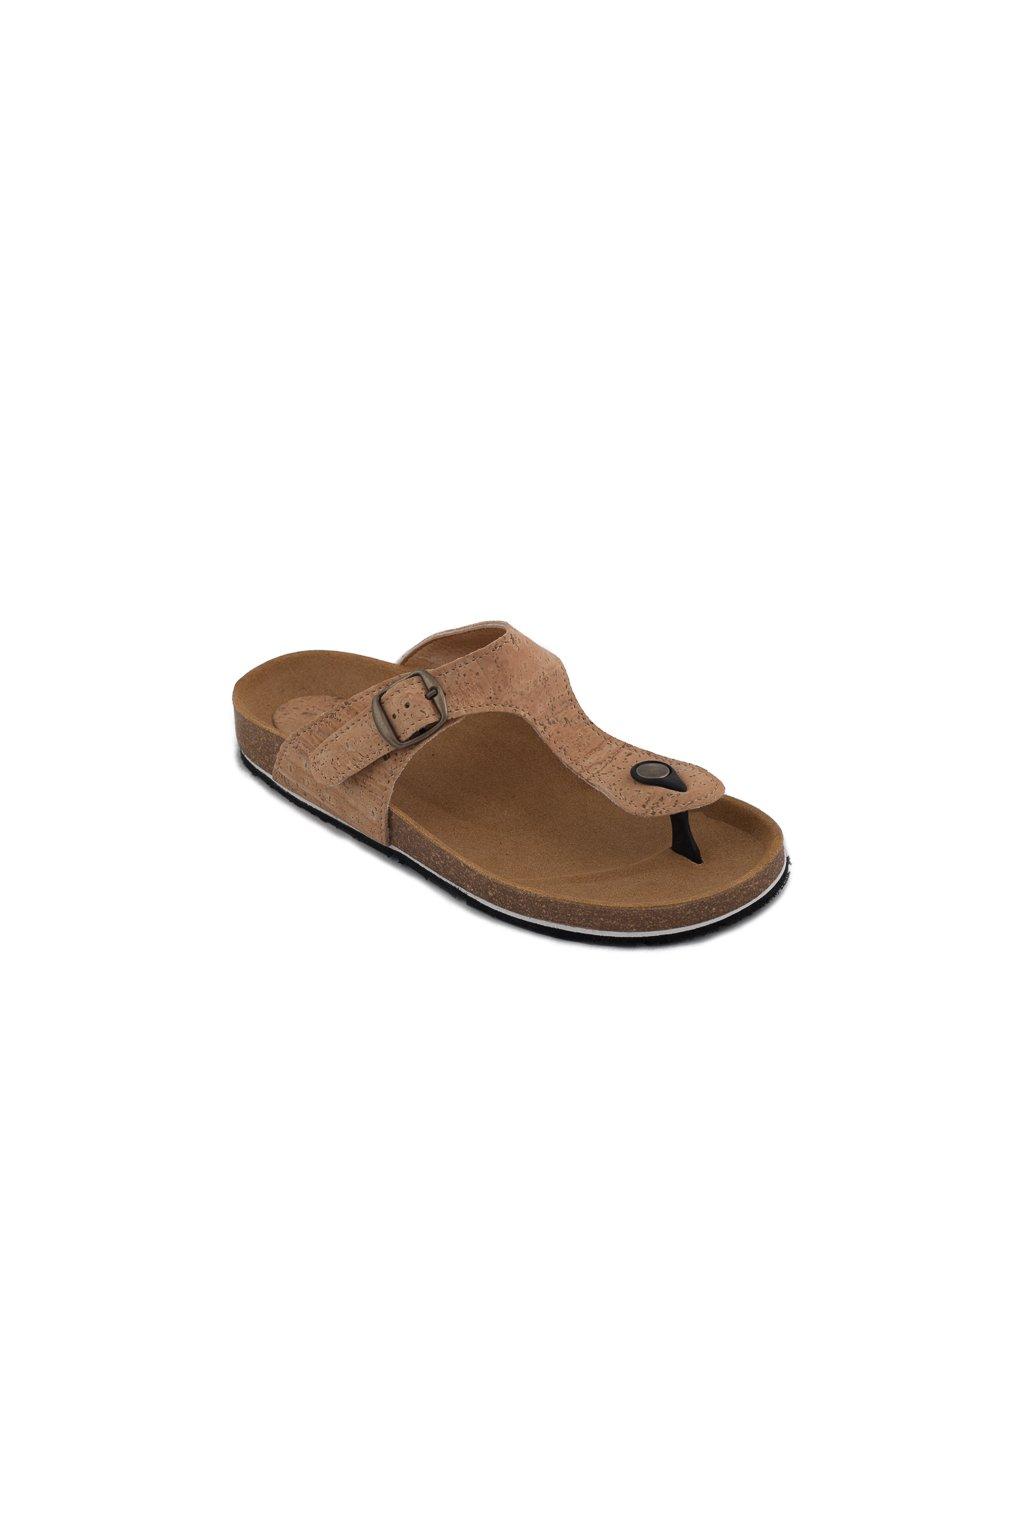 "Korkové sandálky ""Kos Cork"""